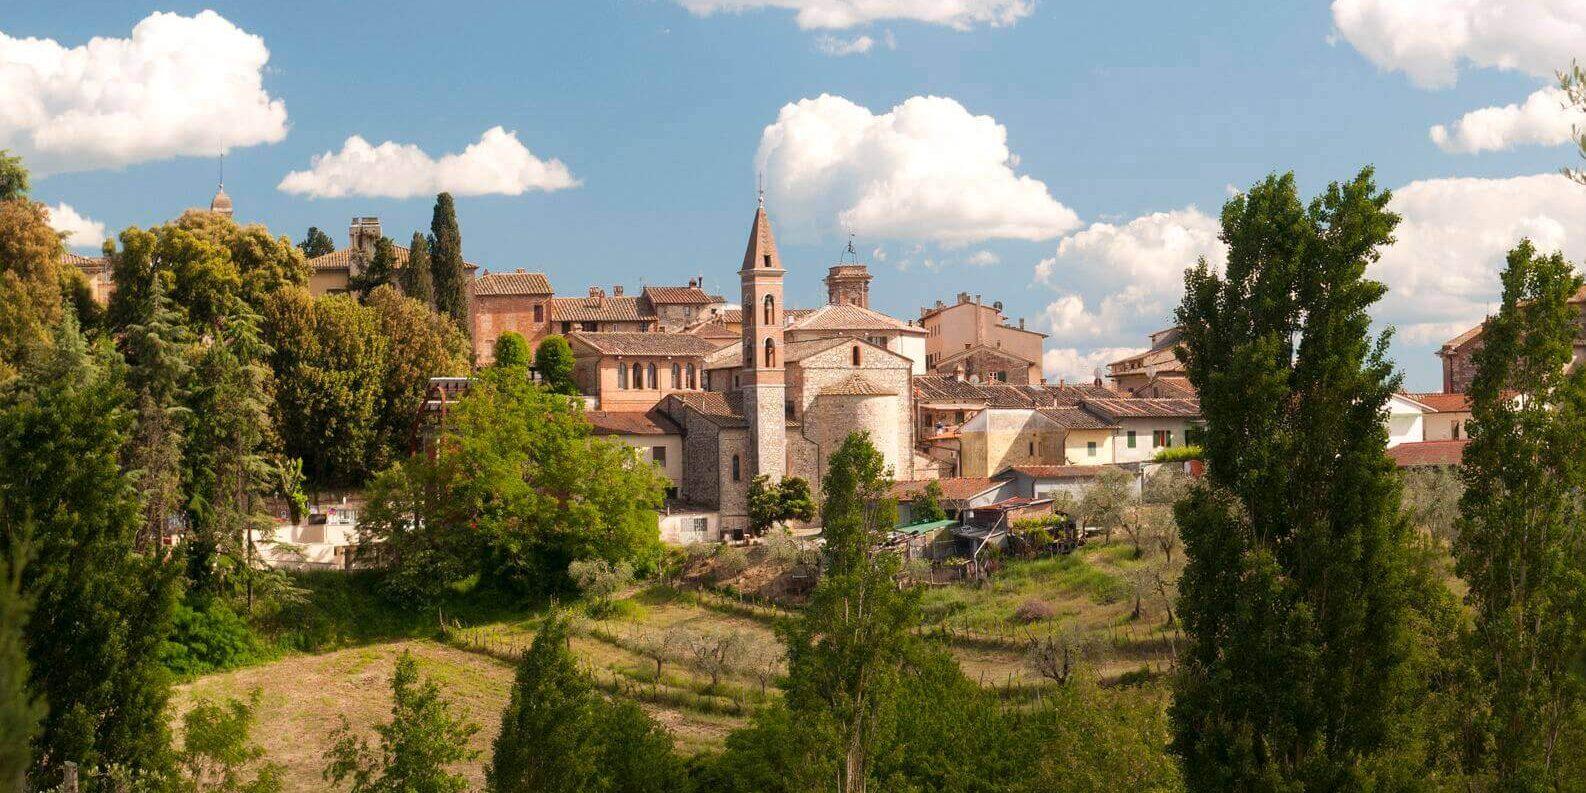 14-VisitChianti-Castelnuovo_Berardenga_(5771488175)-1586x1139